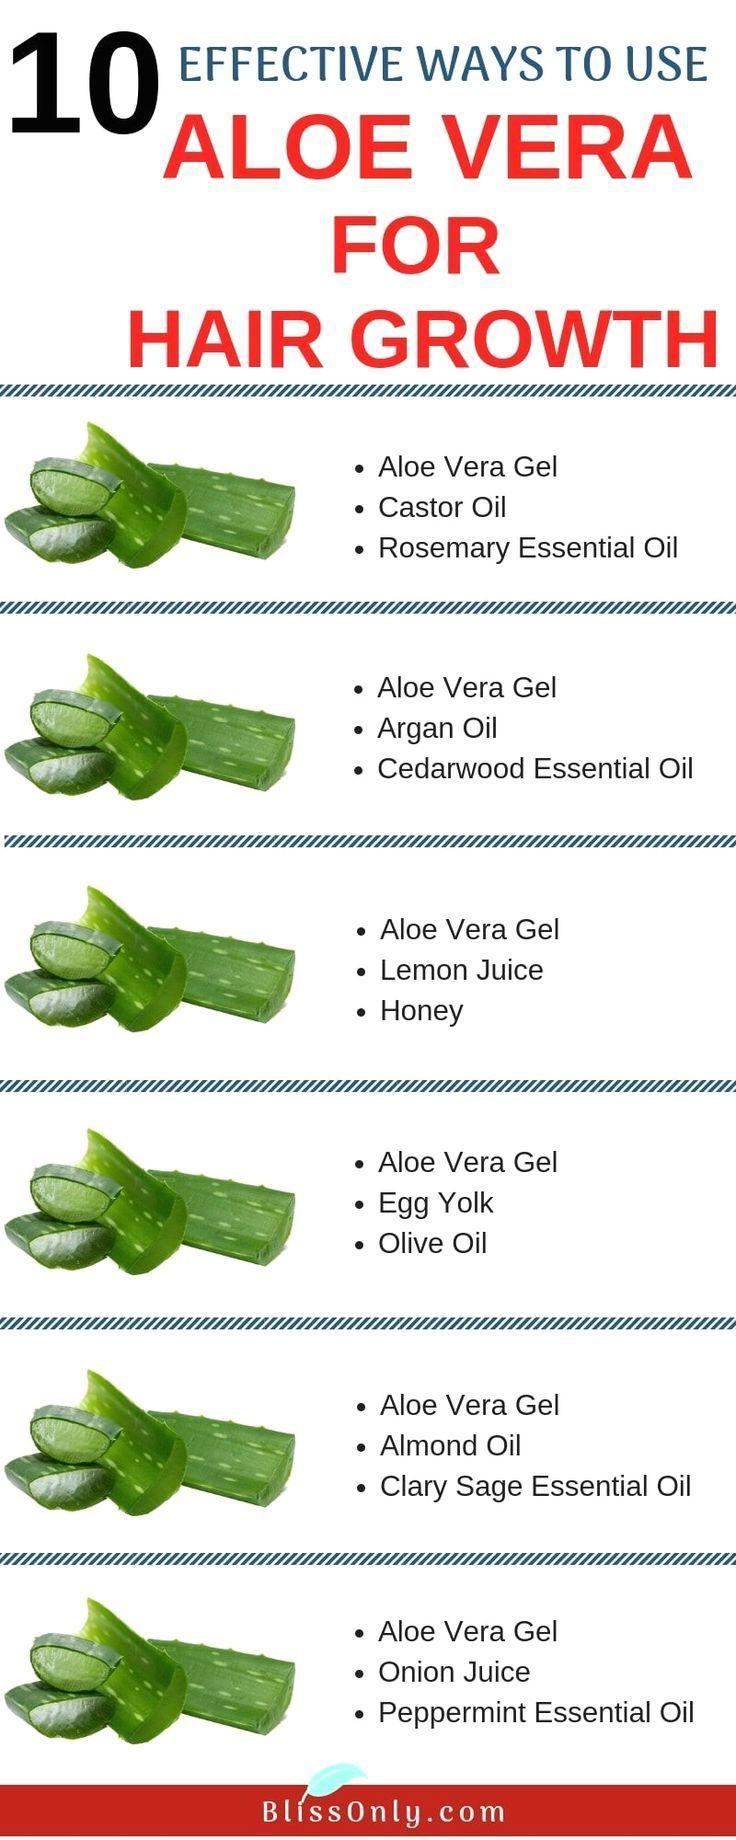 Best Aloe Vera Gel For Hair Growth Aloe Dandruffprevention Gel